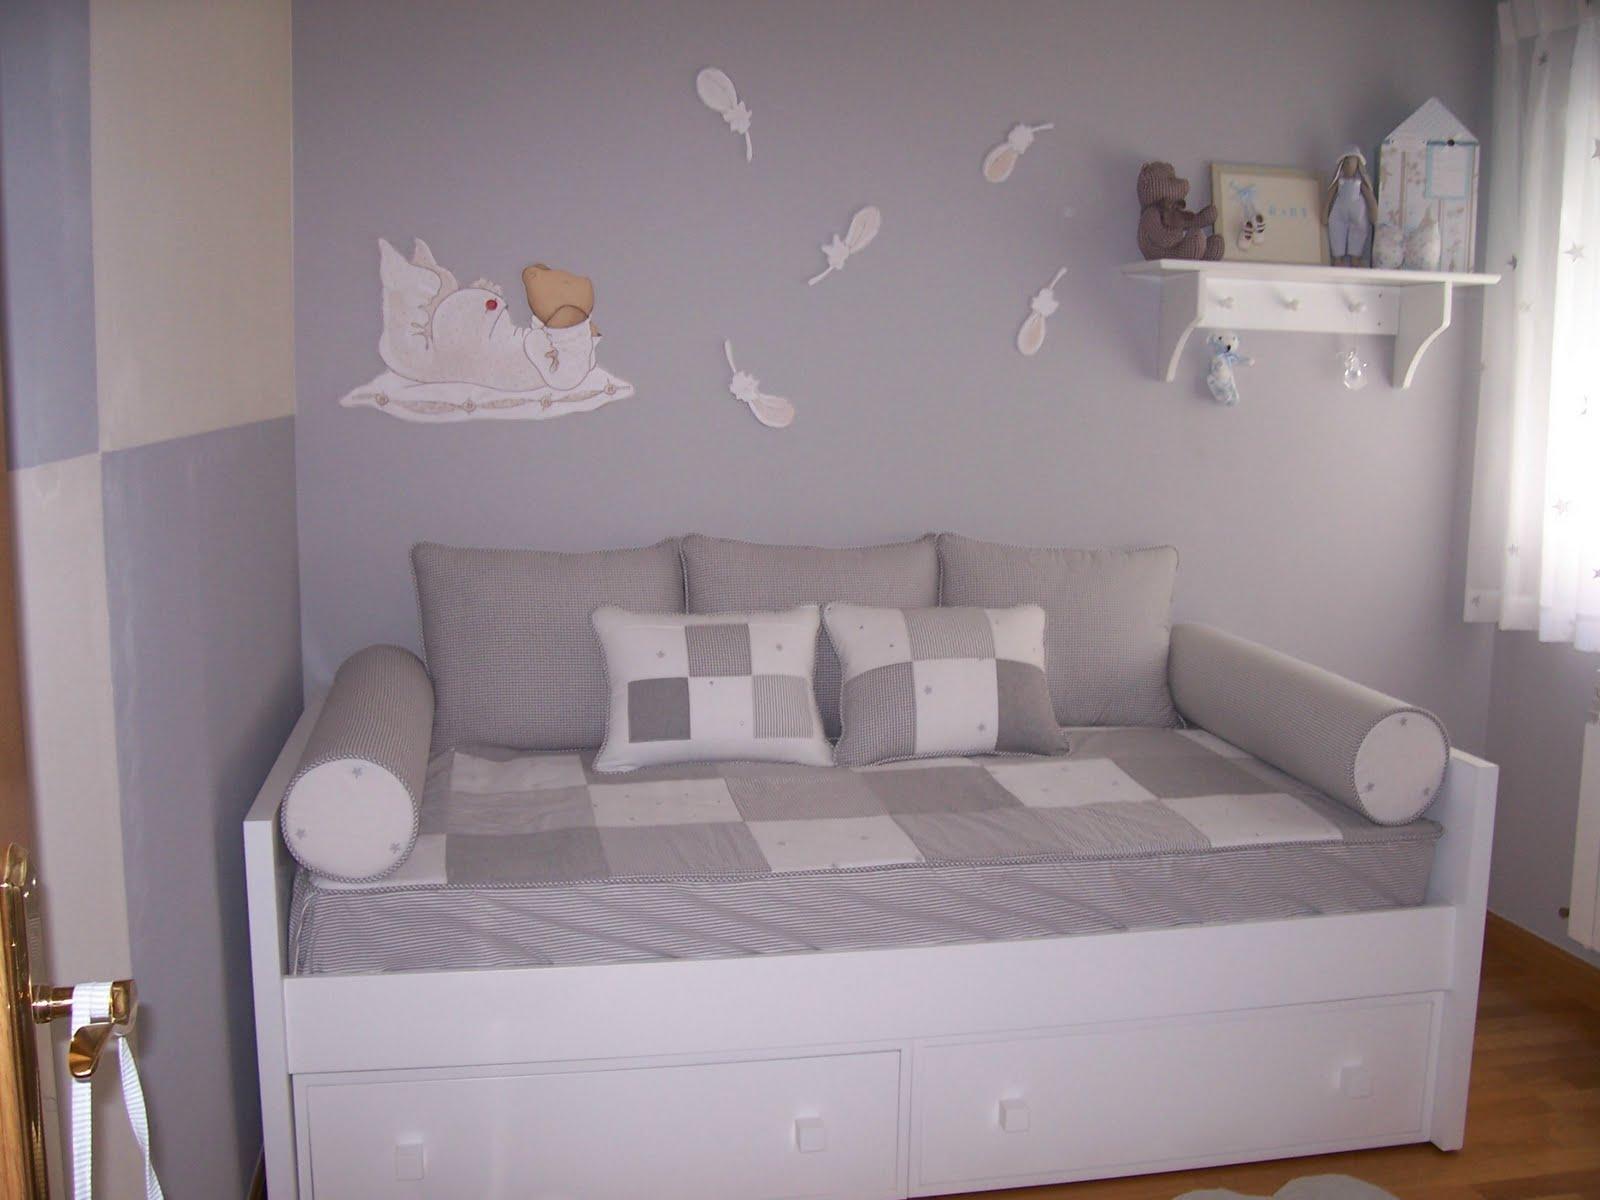 Ikea comoda de 4 cajones